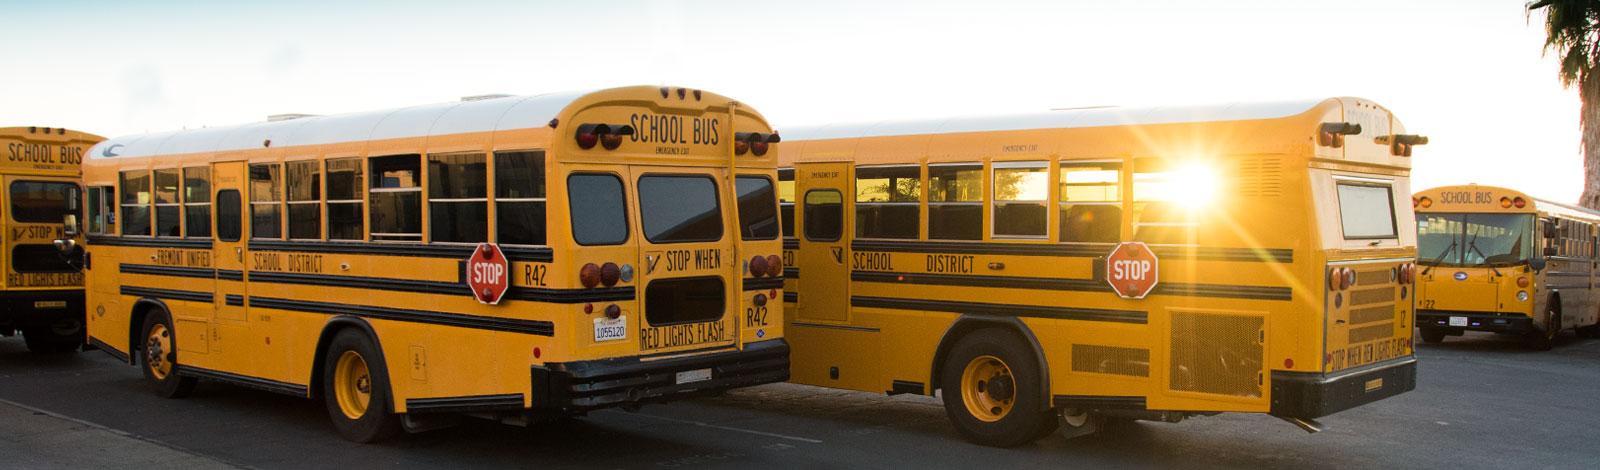 newschool-bus-type-d-image-header